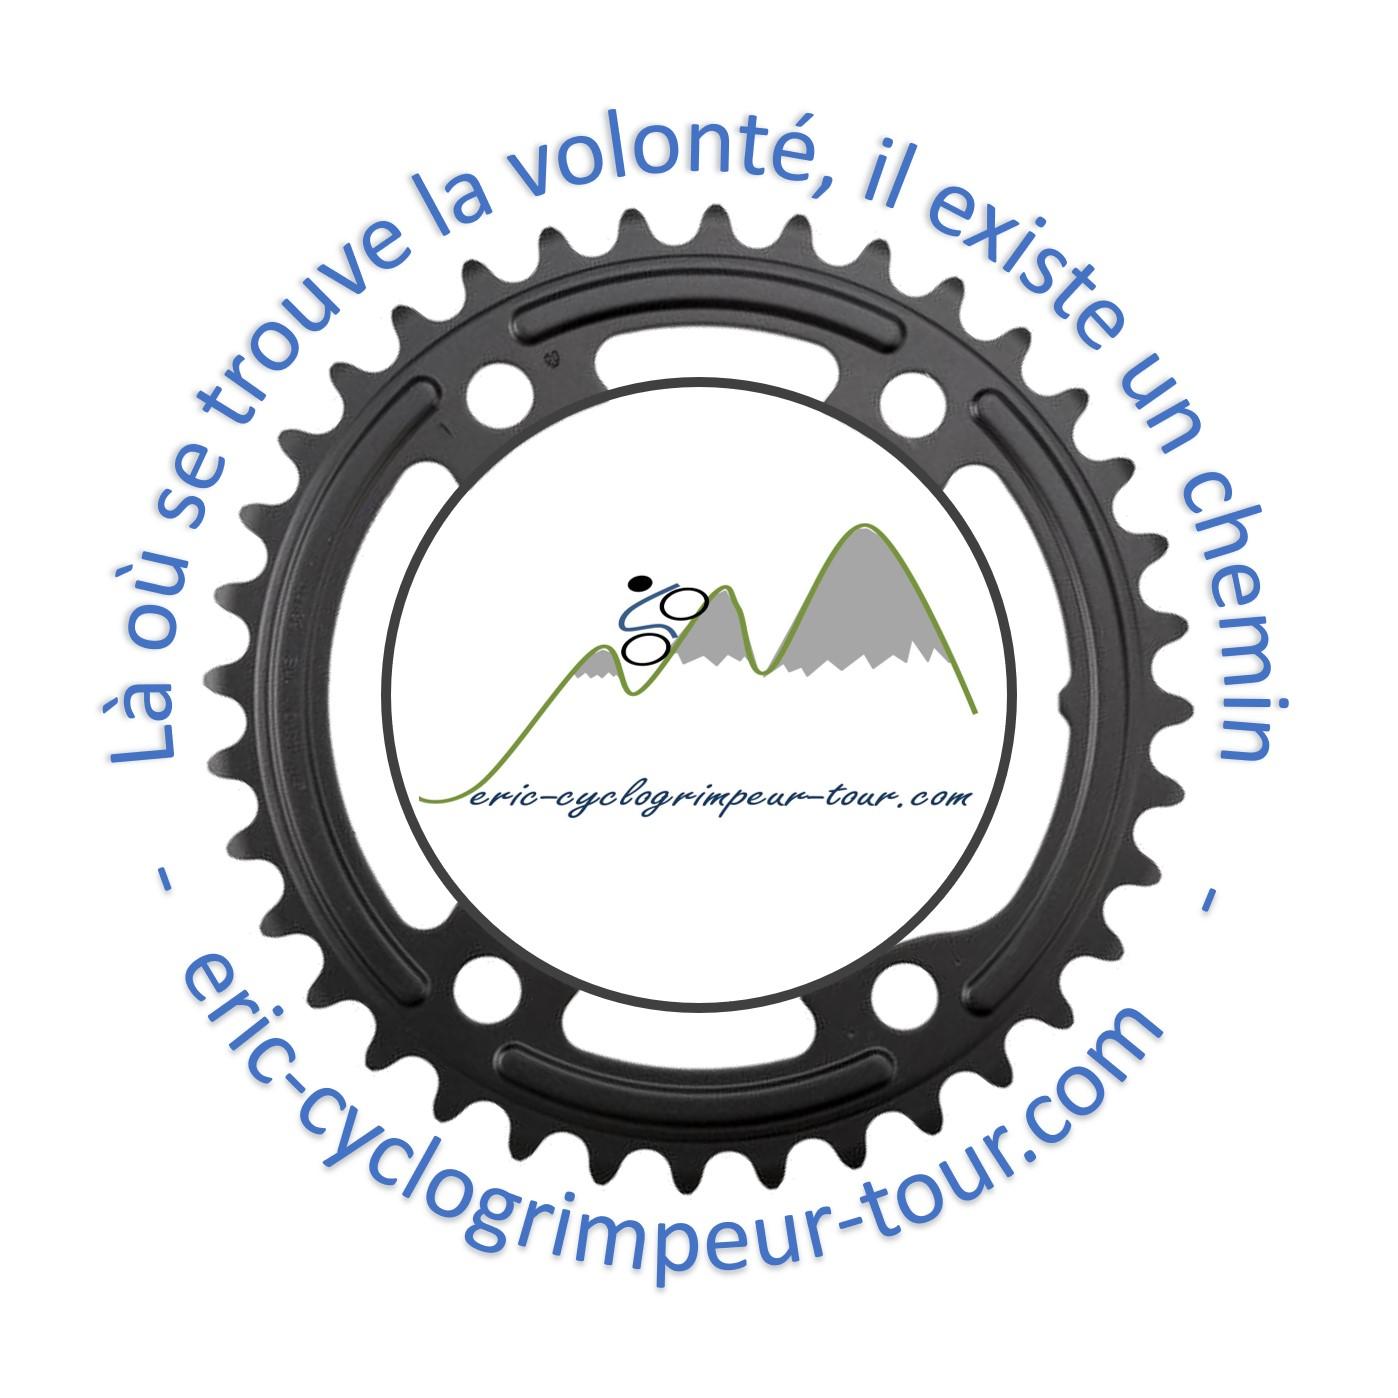 eric-cyclogrimpeur-tour.com